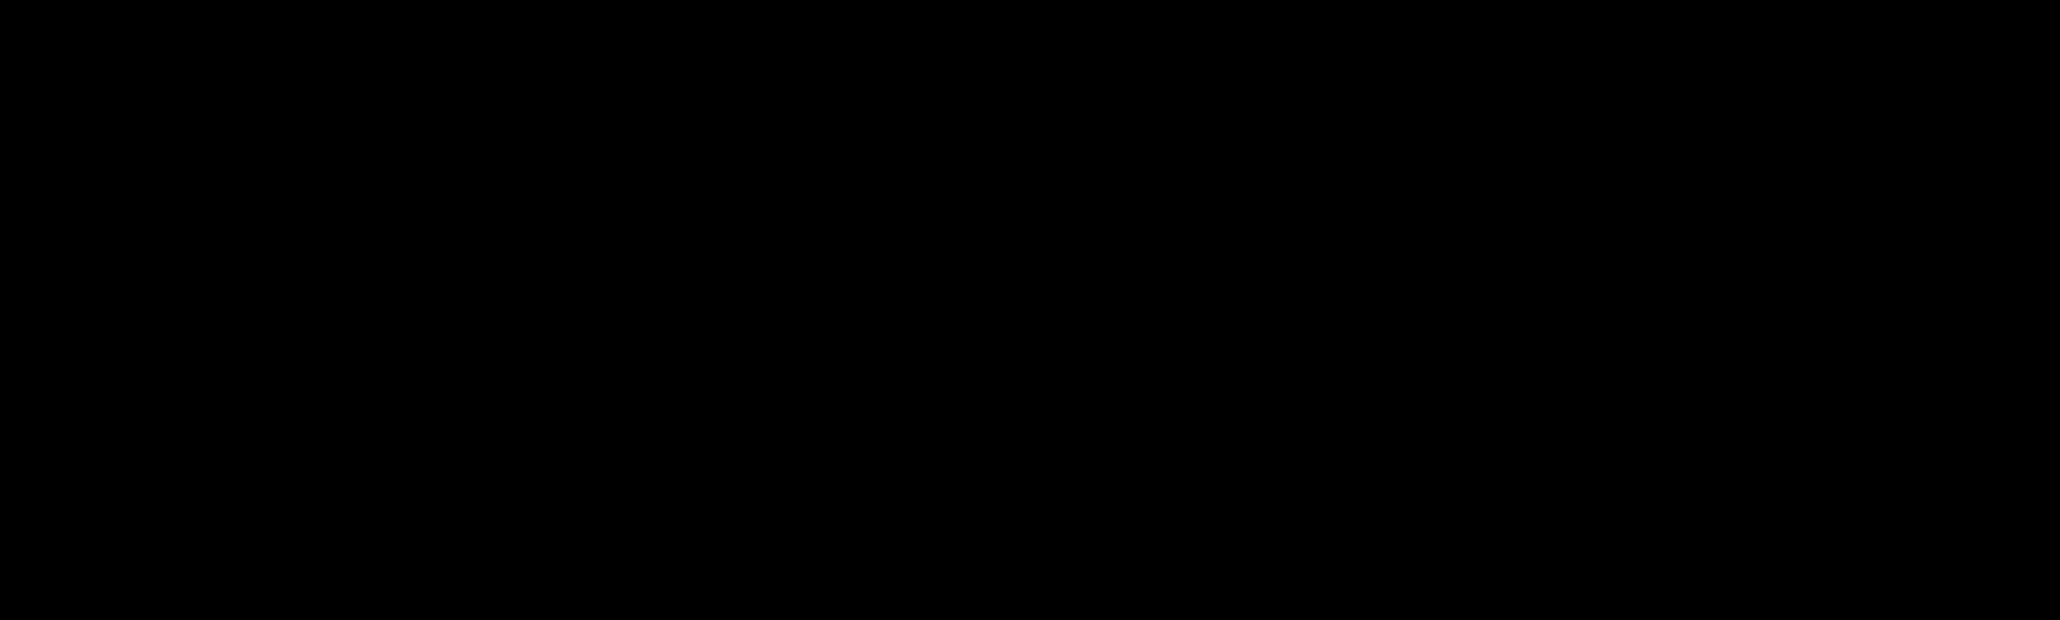 (S)-tert-Butyl 5-amino-1-(4-((2-amino-9H-purin-6-yloxy)methyl)benzylamino)-1-oxopentan-2-ylcarbamate